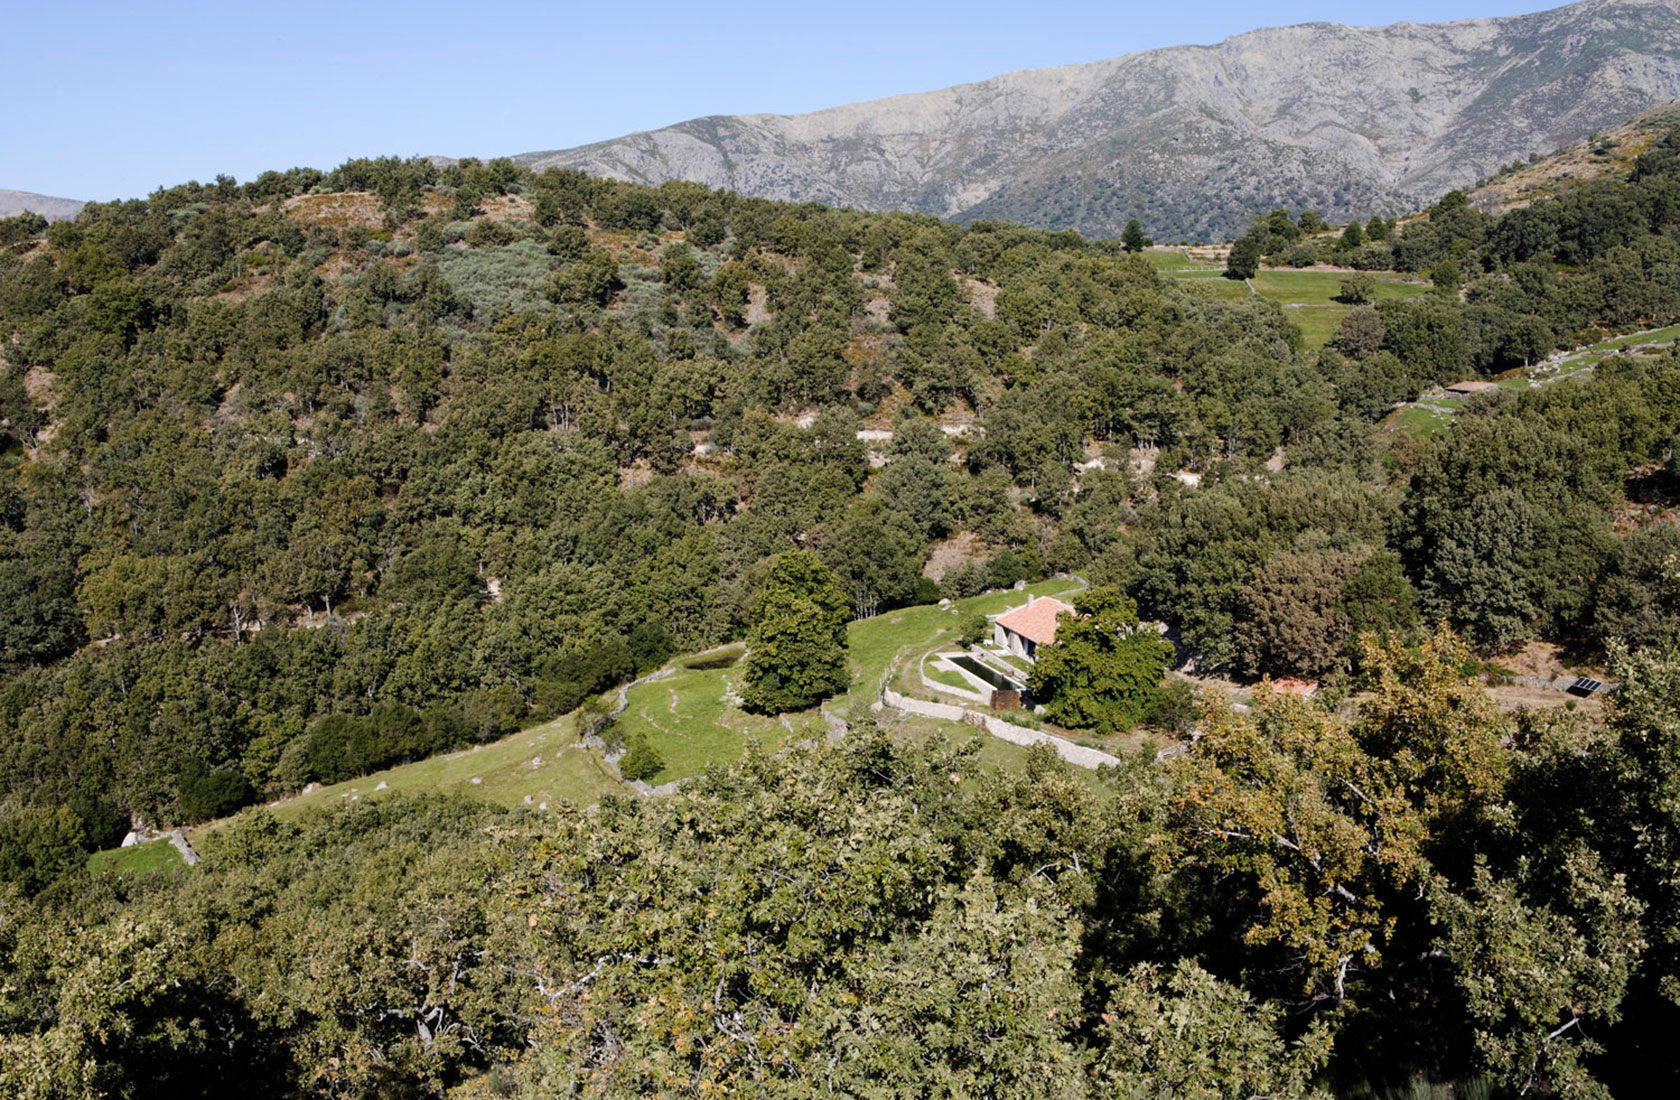 Vista aérea de la Casa reformada Finca Extremadura